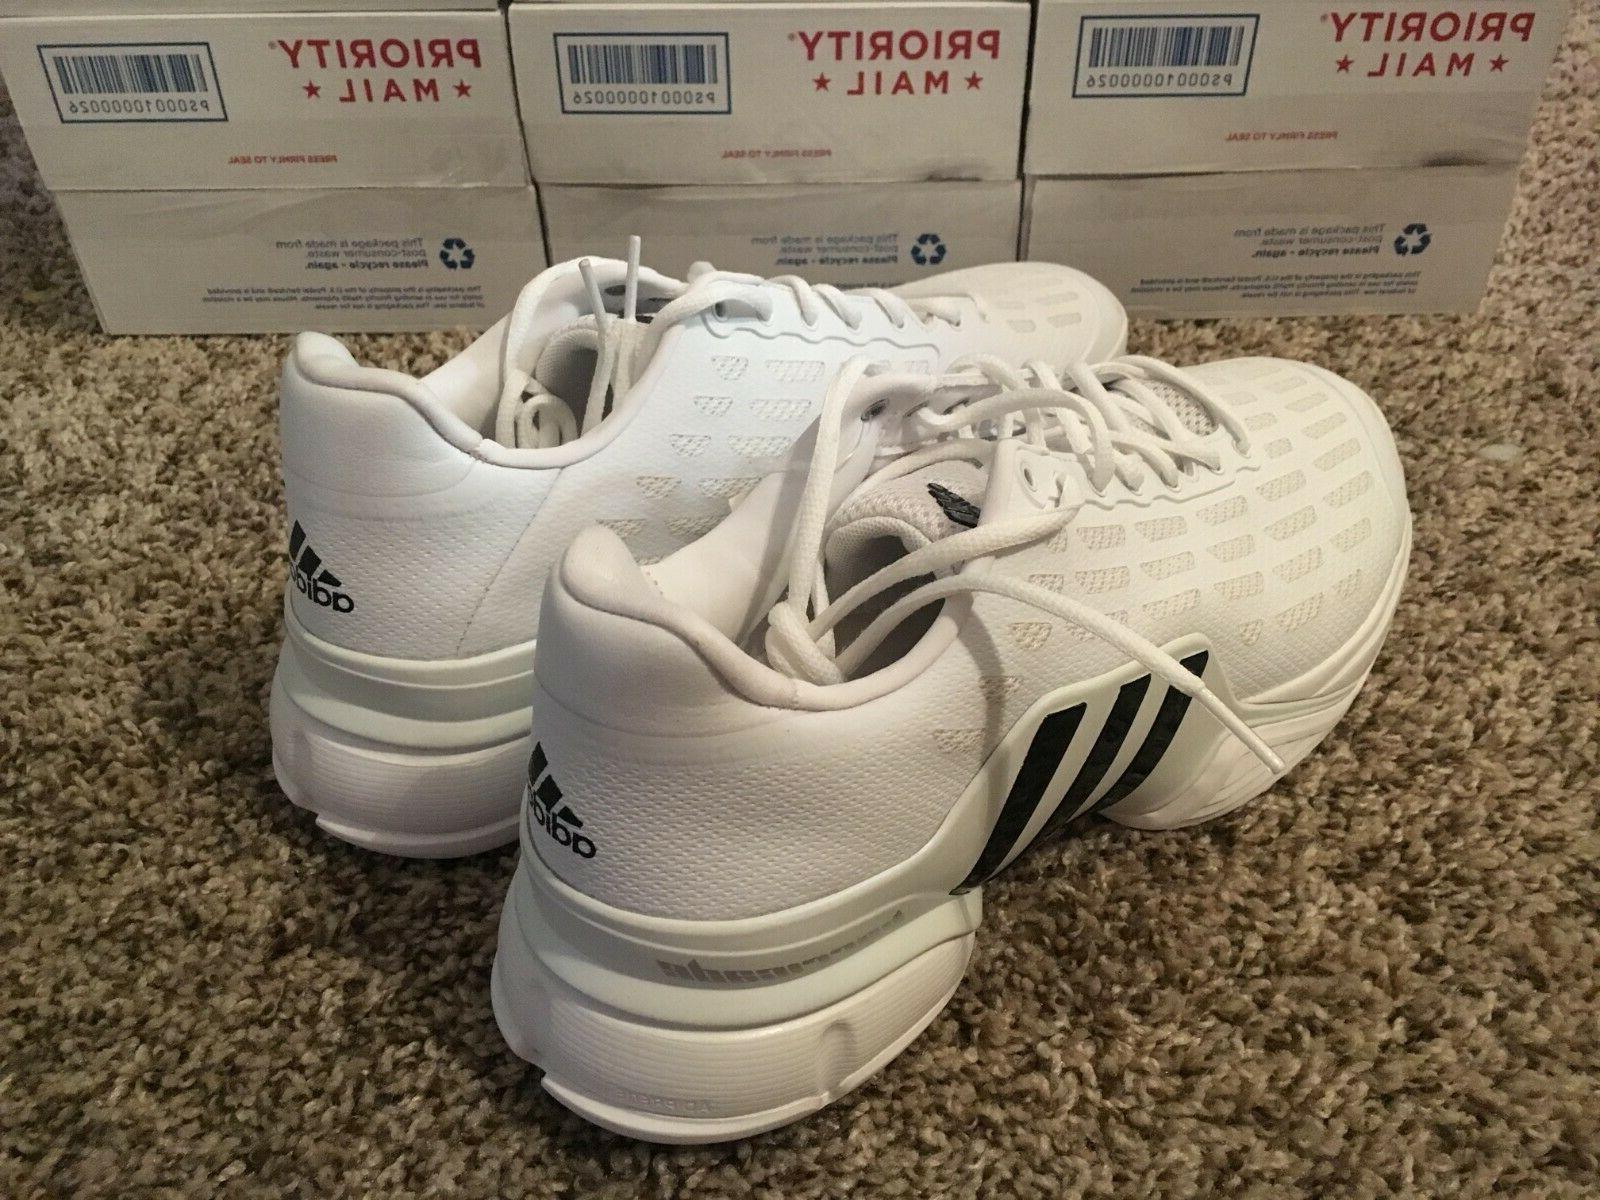 Adidas Barricade Grass AF6790 Size 14